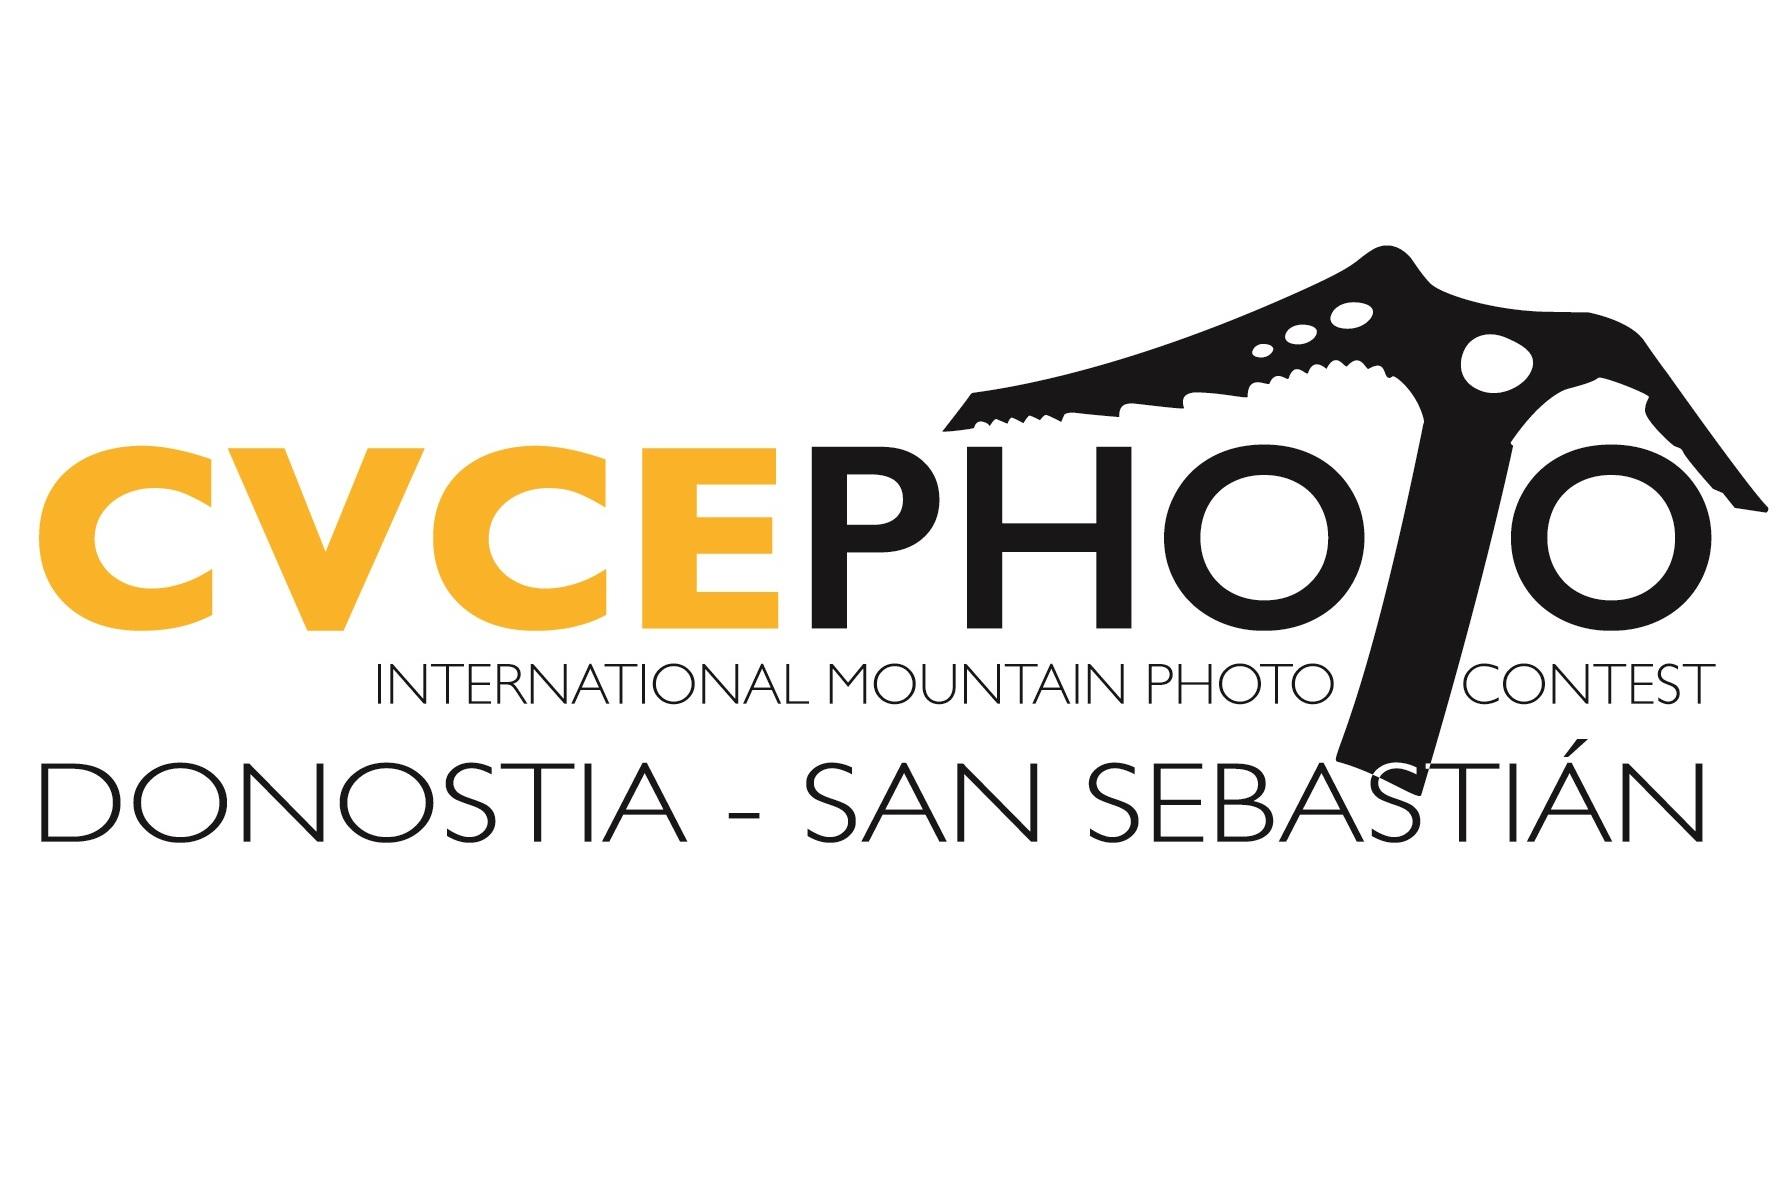 CVCEPHOTO International Mountain Photo Contest 2018